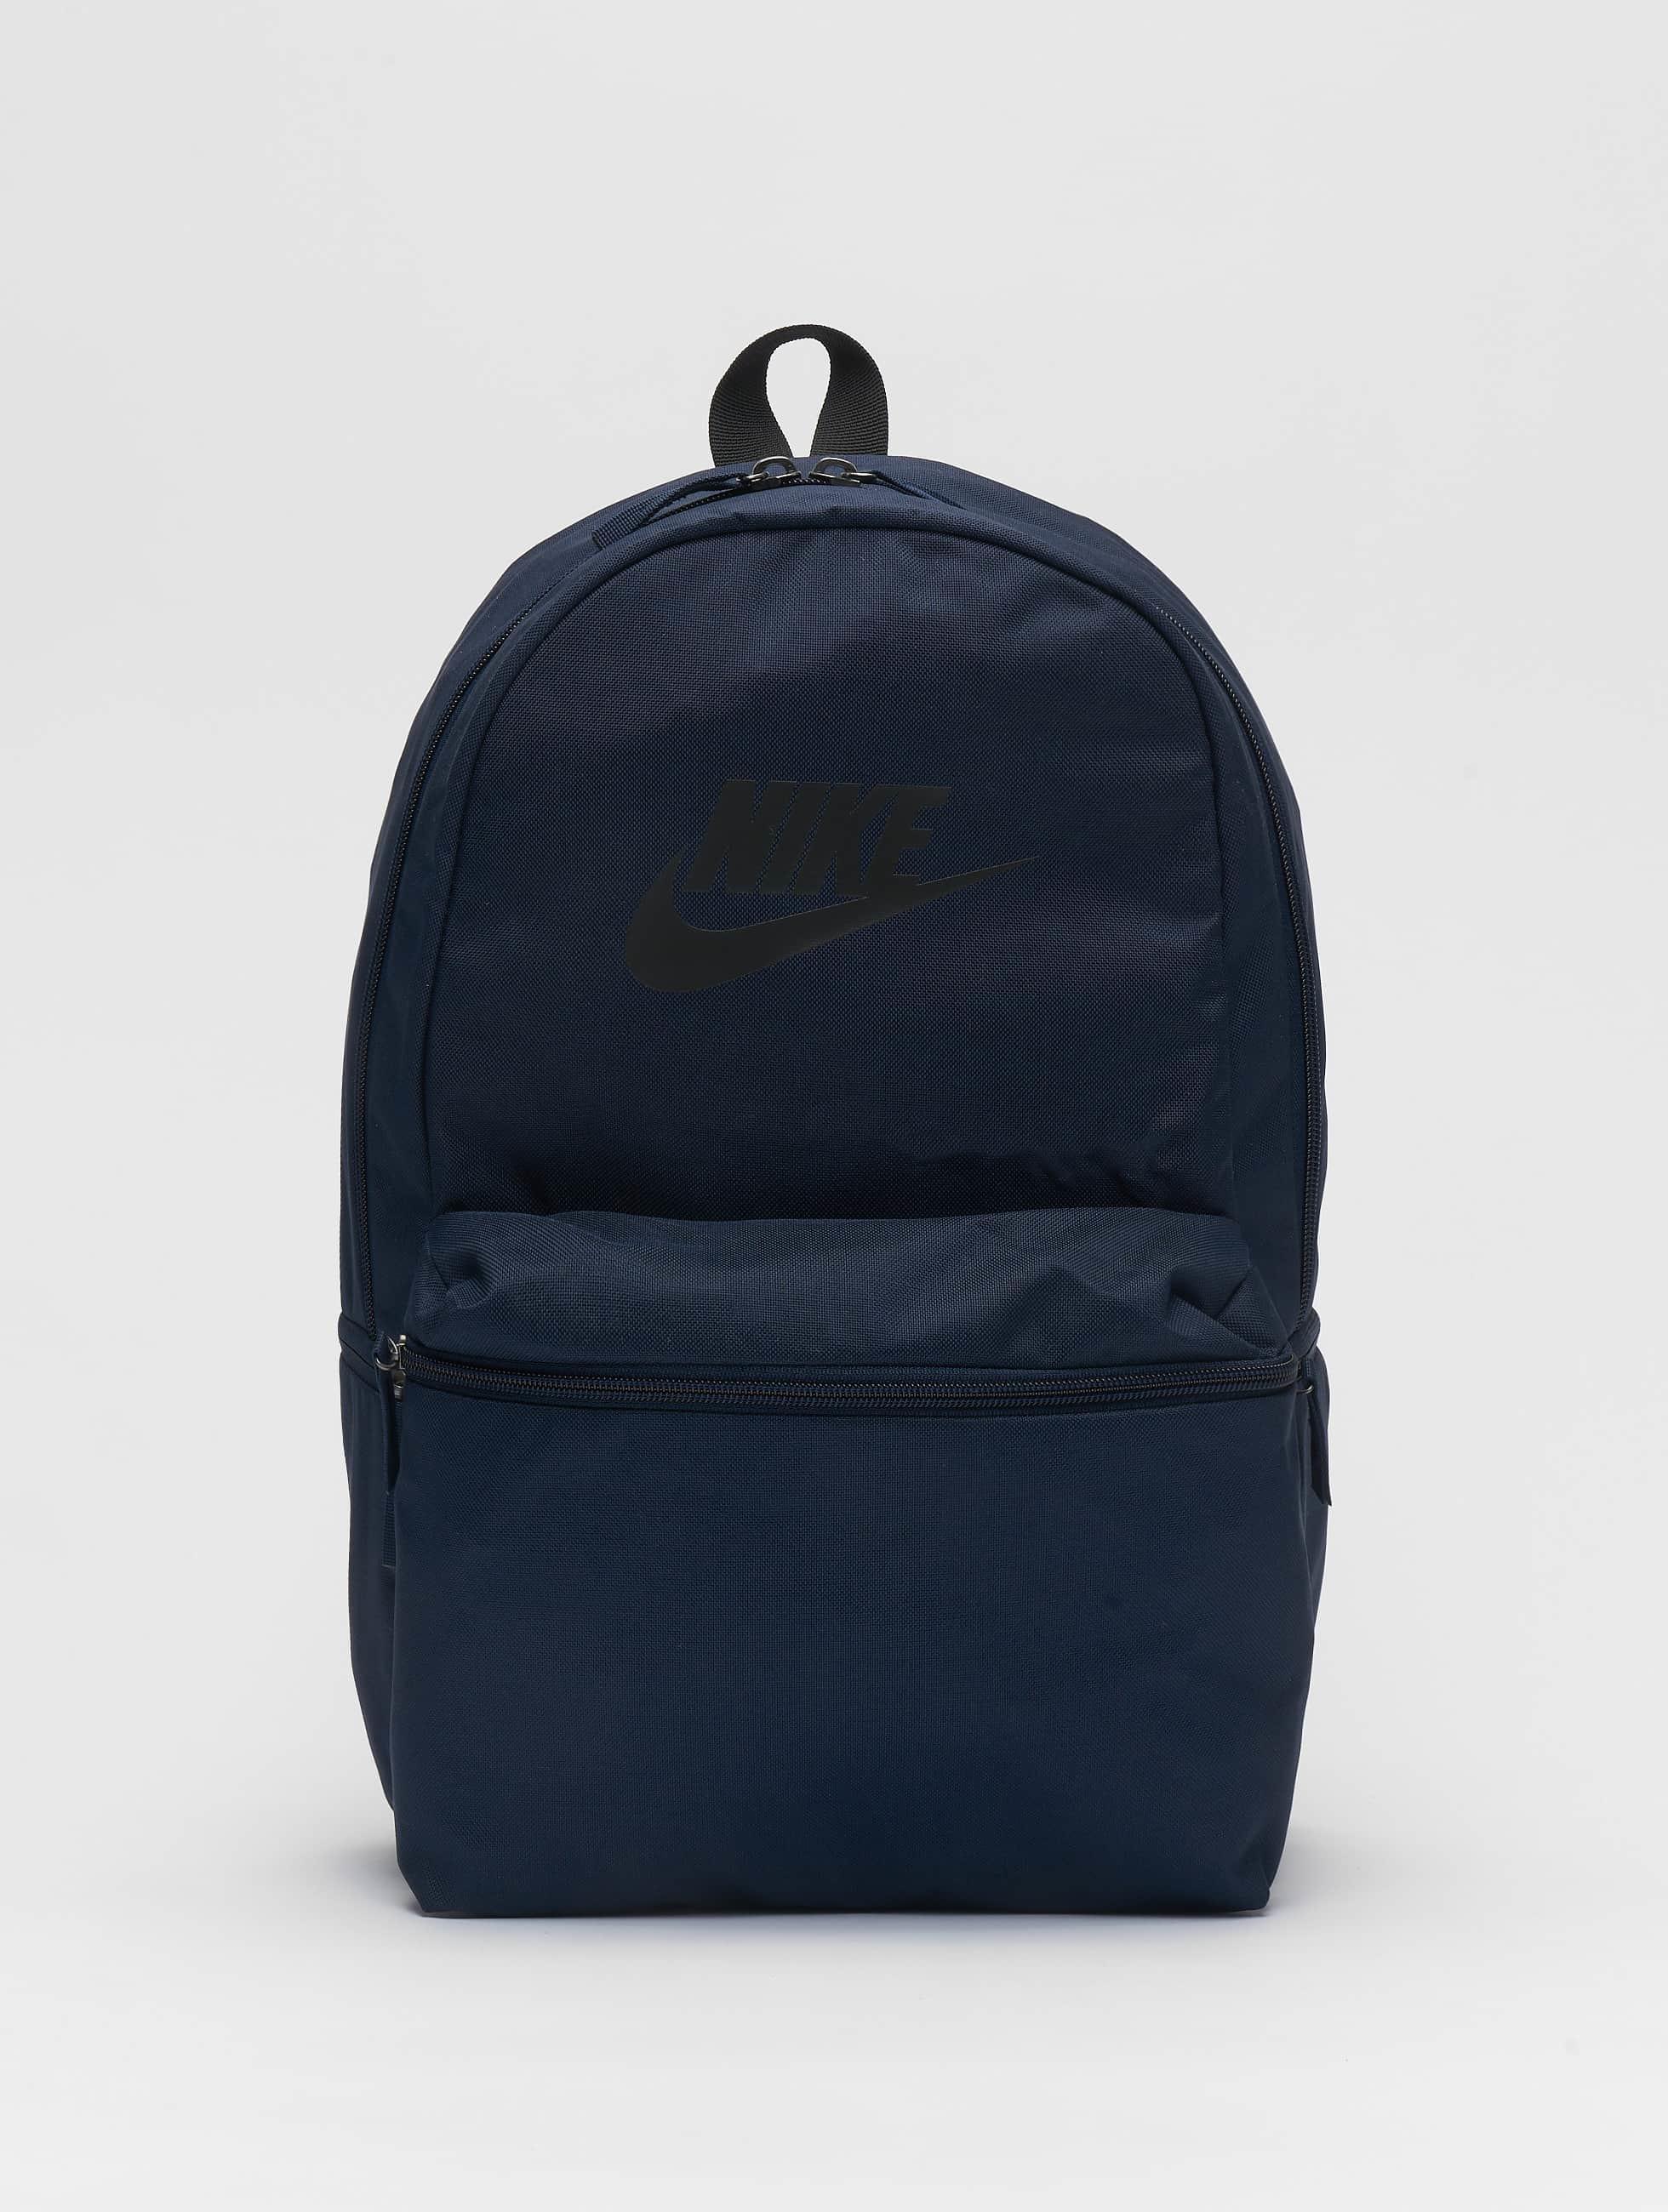 700a7d19b0d Nike SB Accessoires / rugzak Heritage in blauw 669408